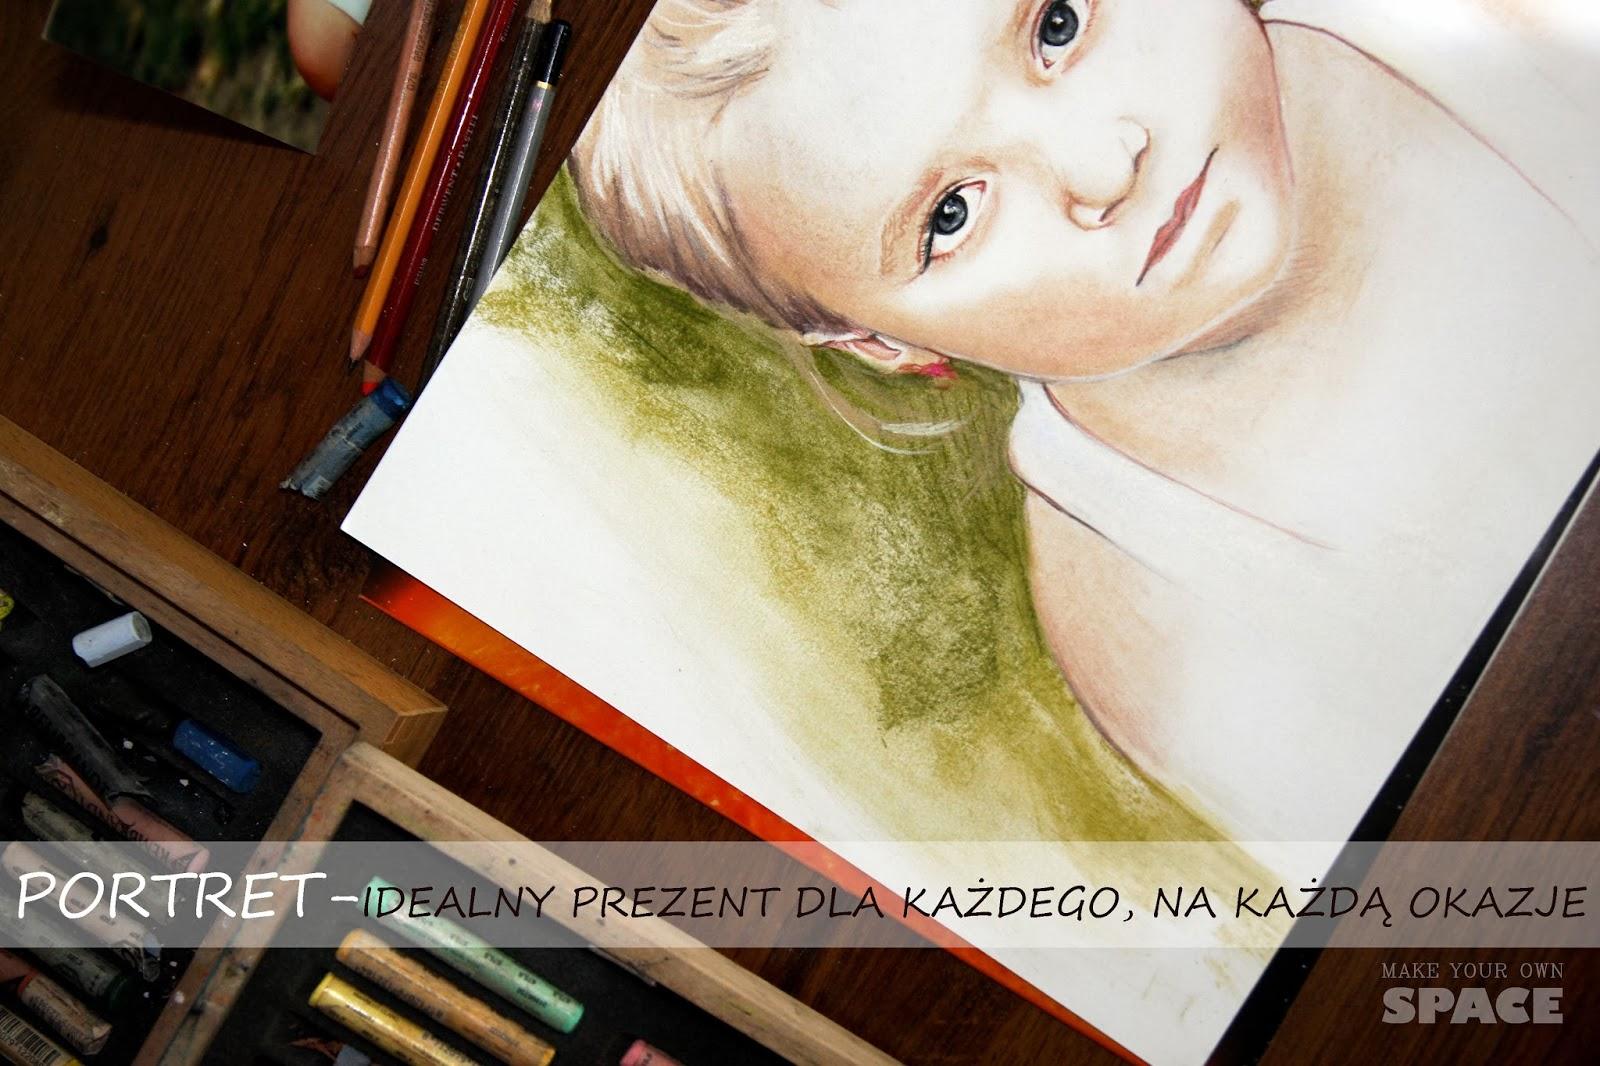 pastele, portret, portret dziecka, prezent, okazja